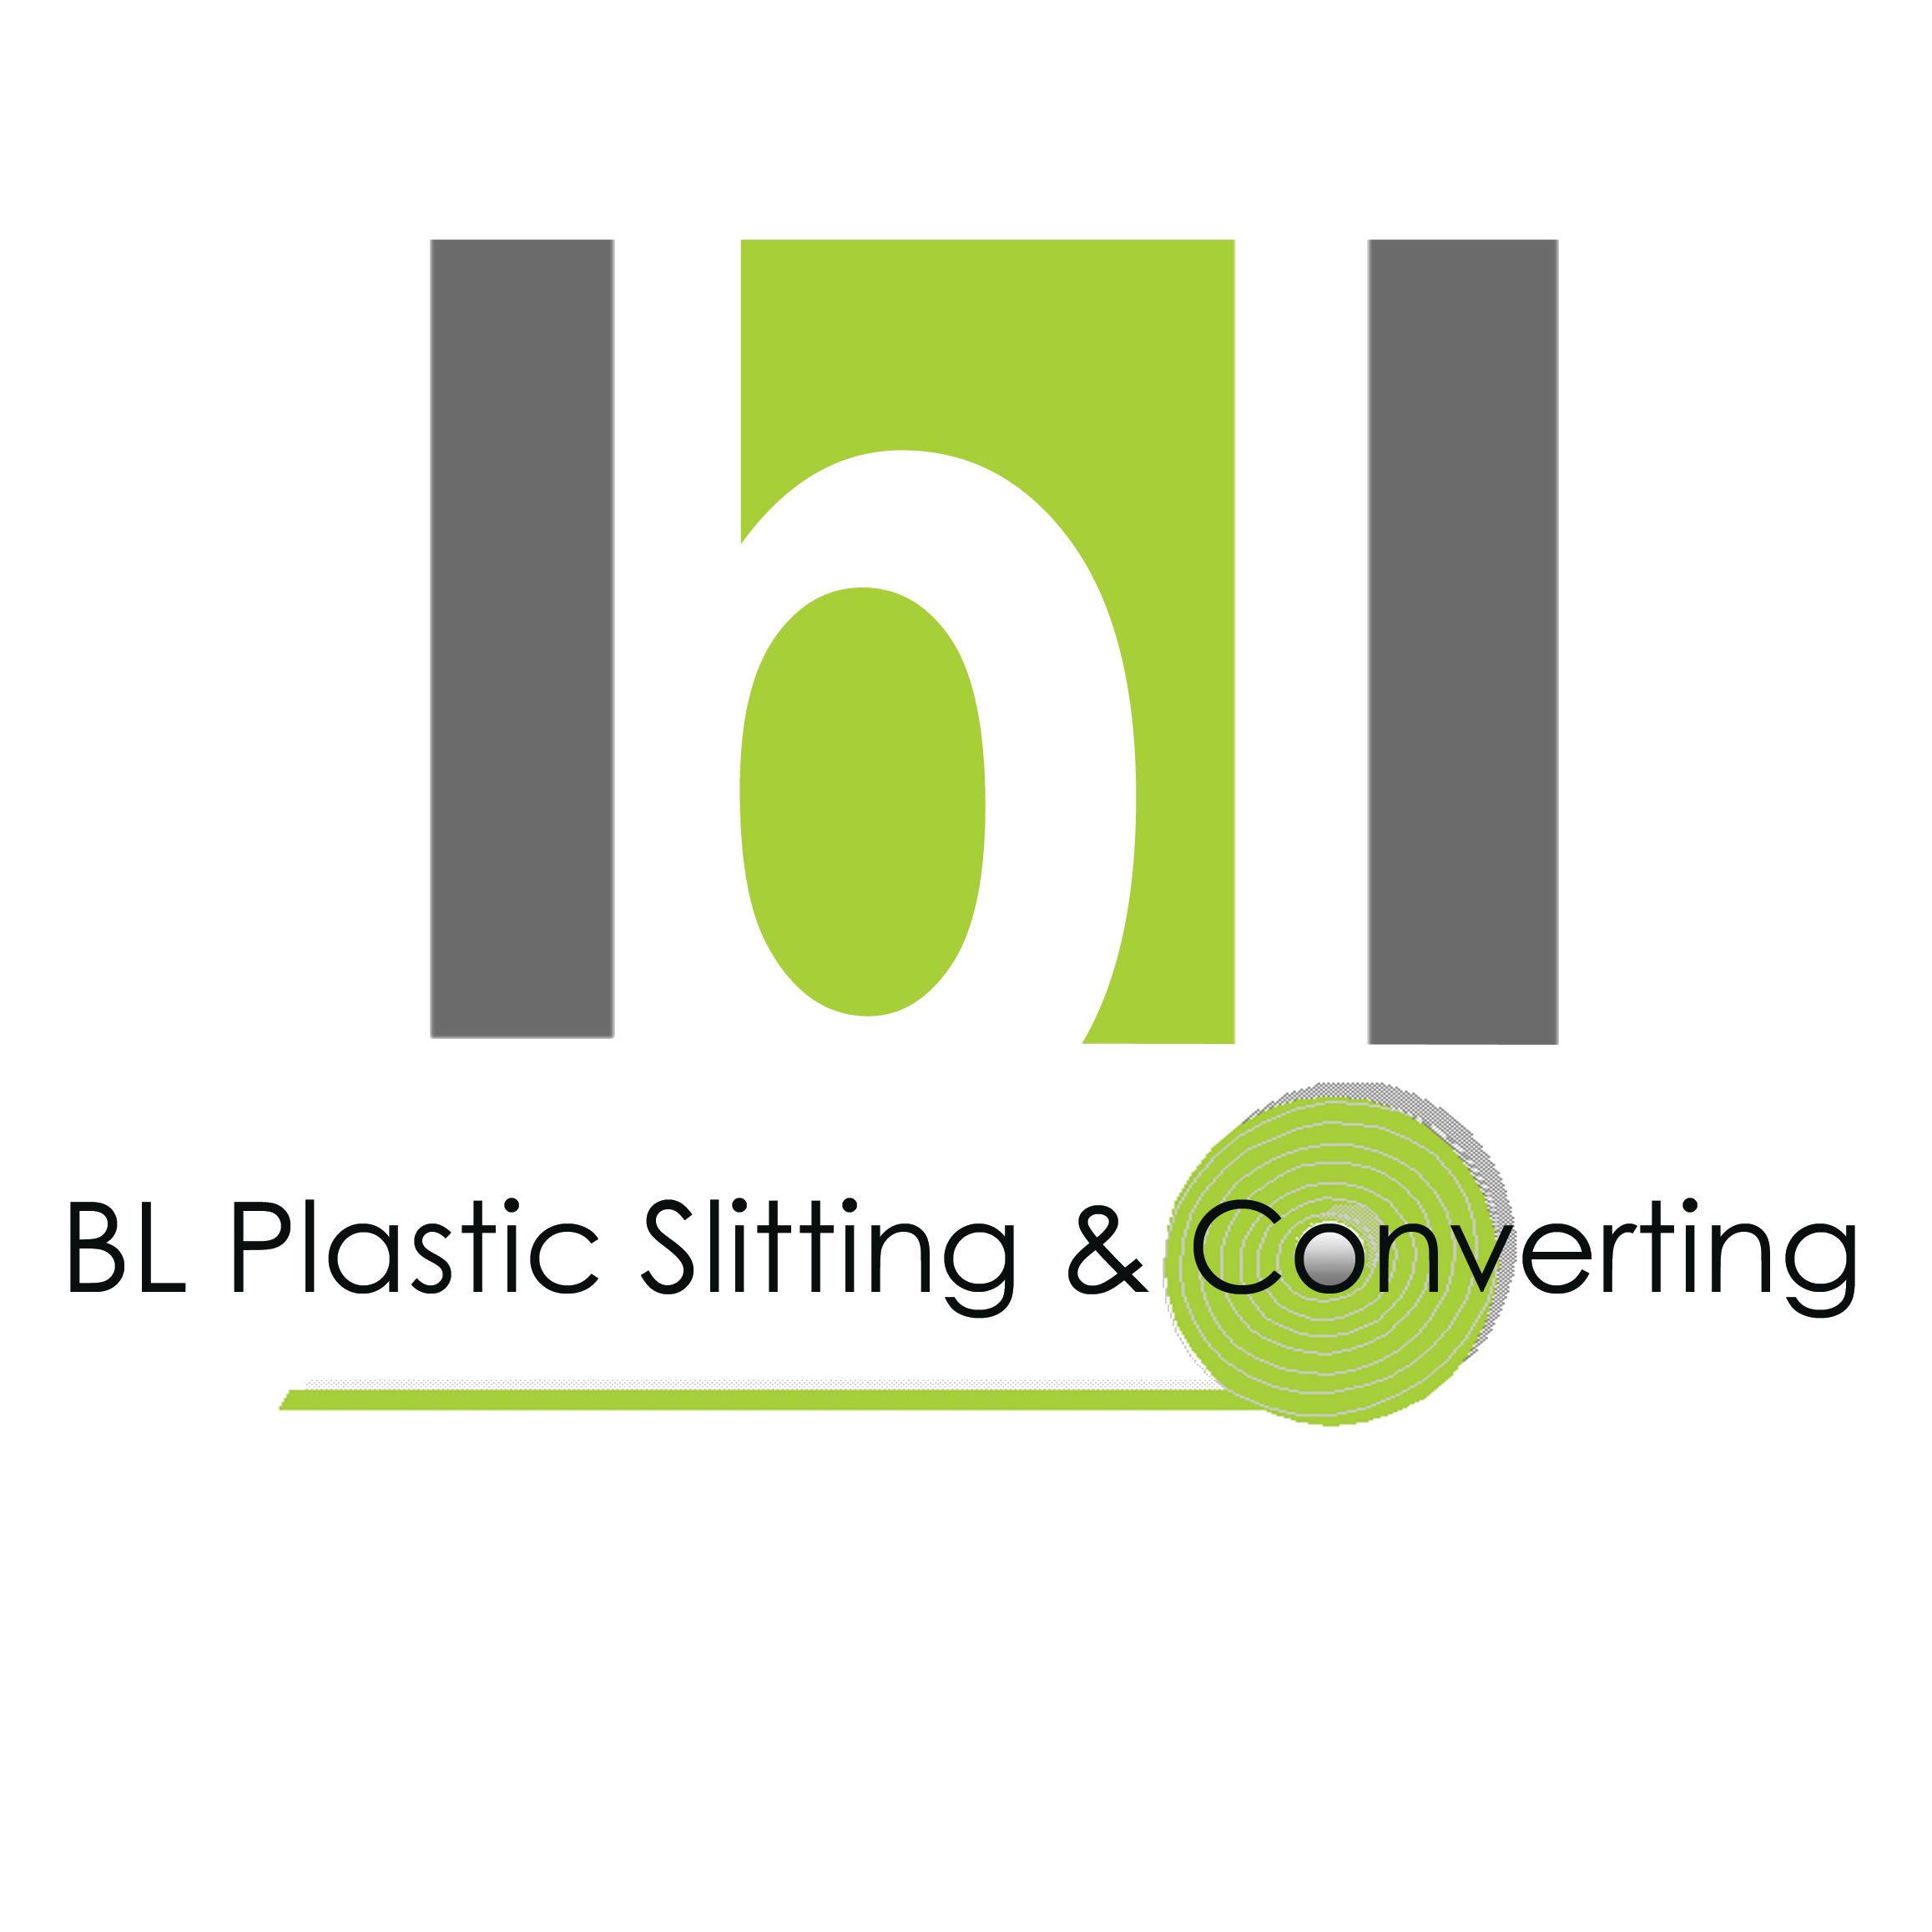 BL Plastic Slitting & Converting